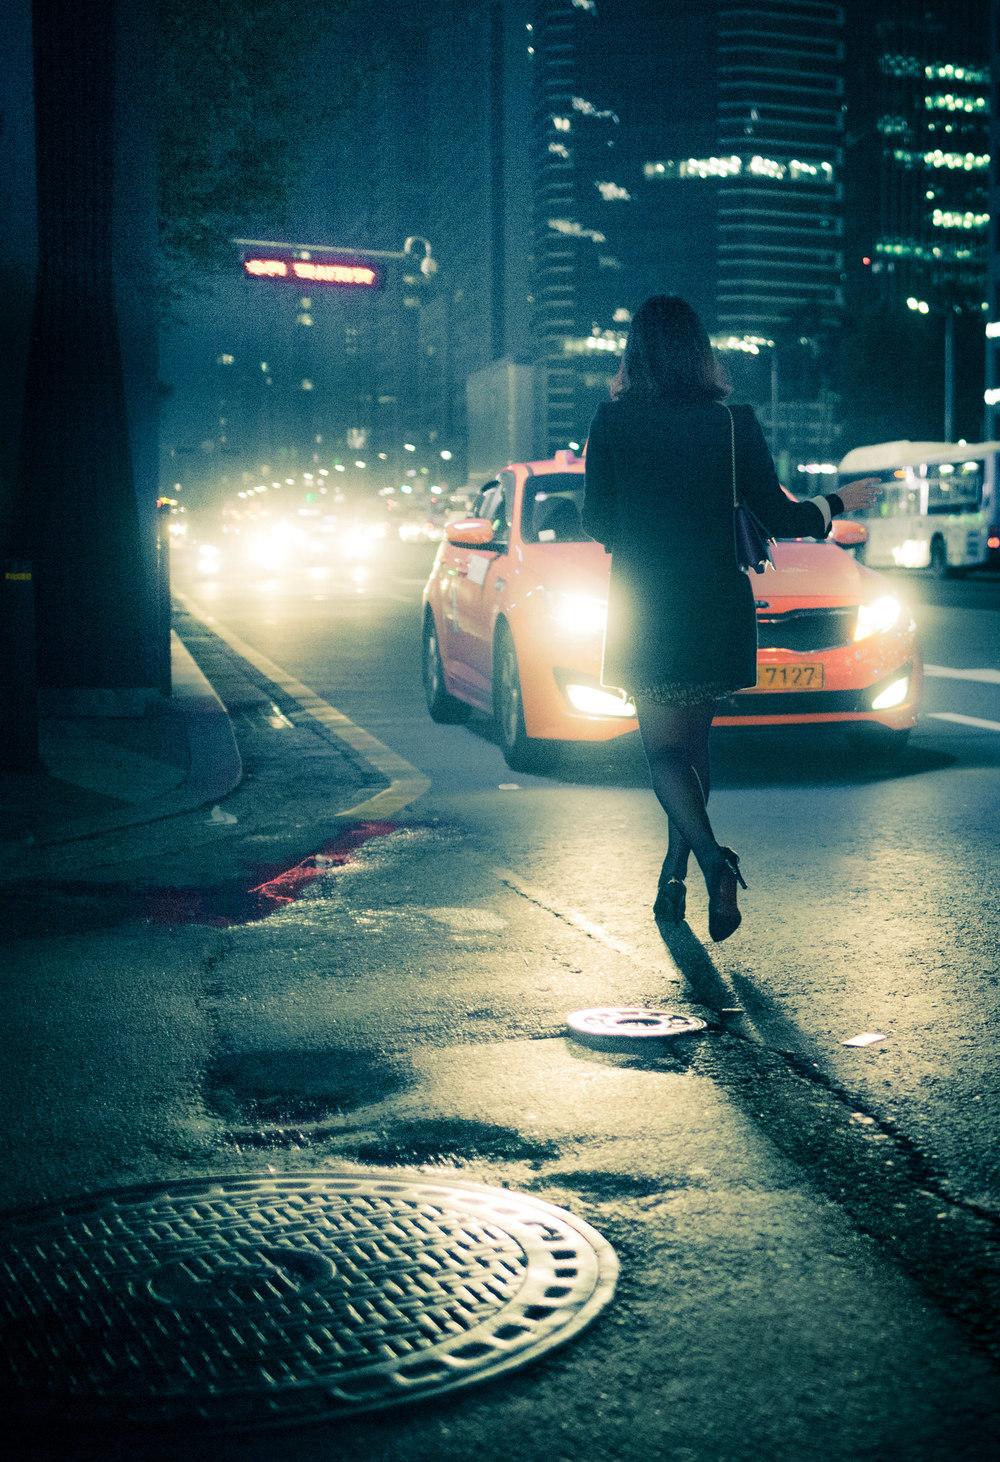 street photography marius vieth